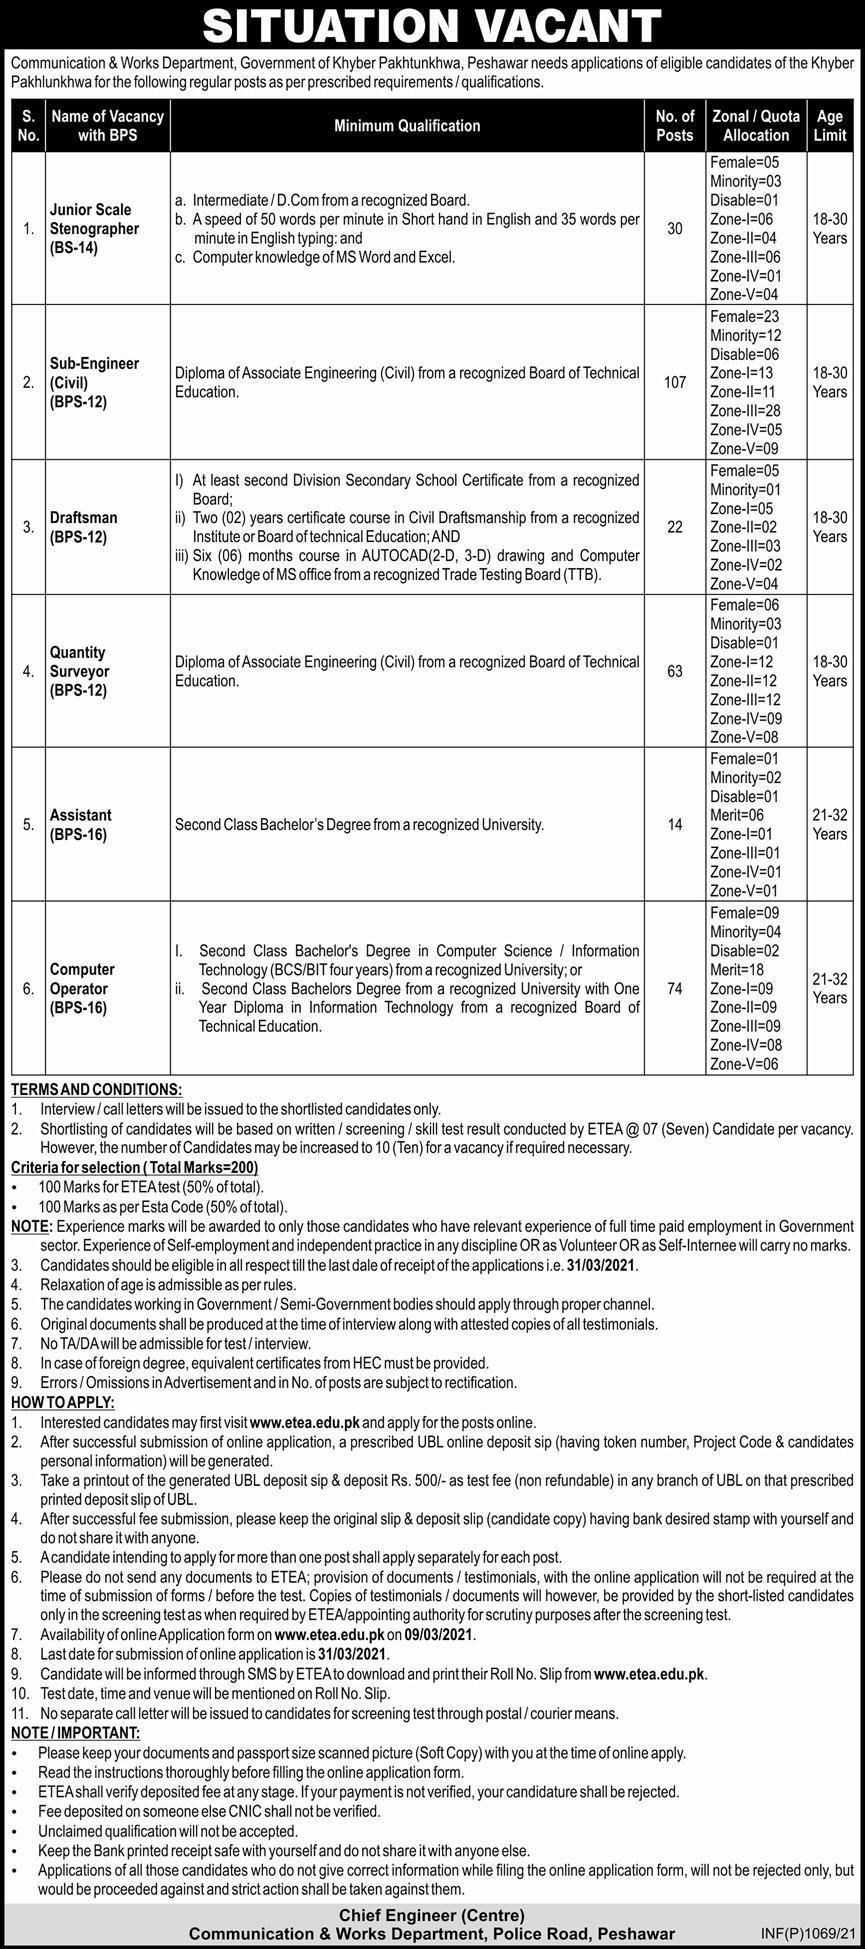 Communication & Works Department Jobs 2021 in Peshawar KPK via ETEA